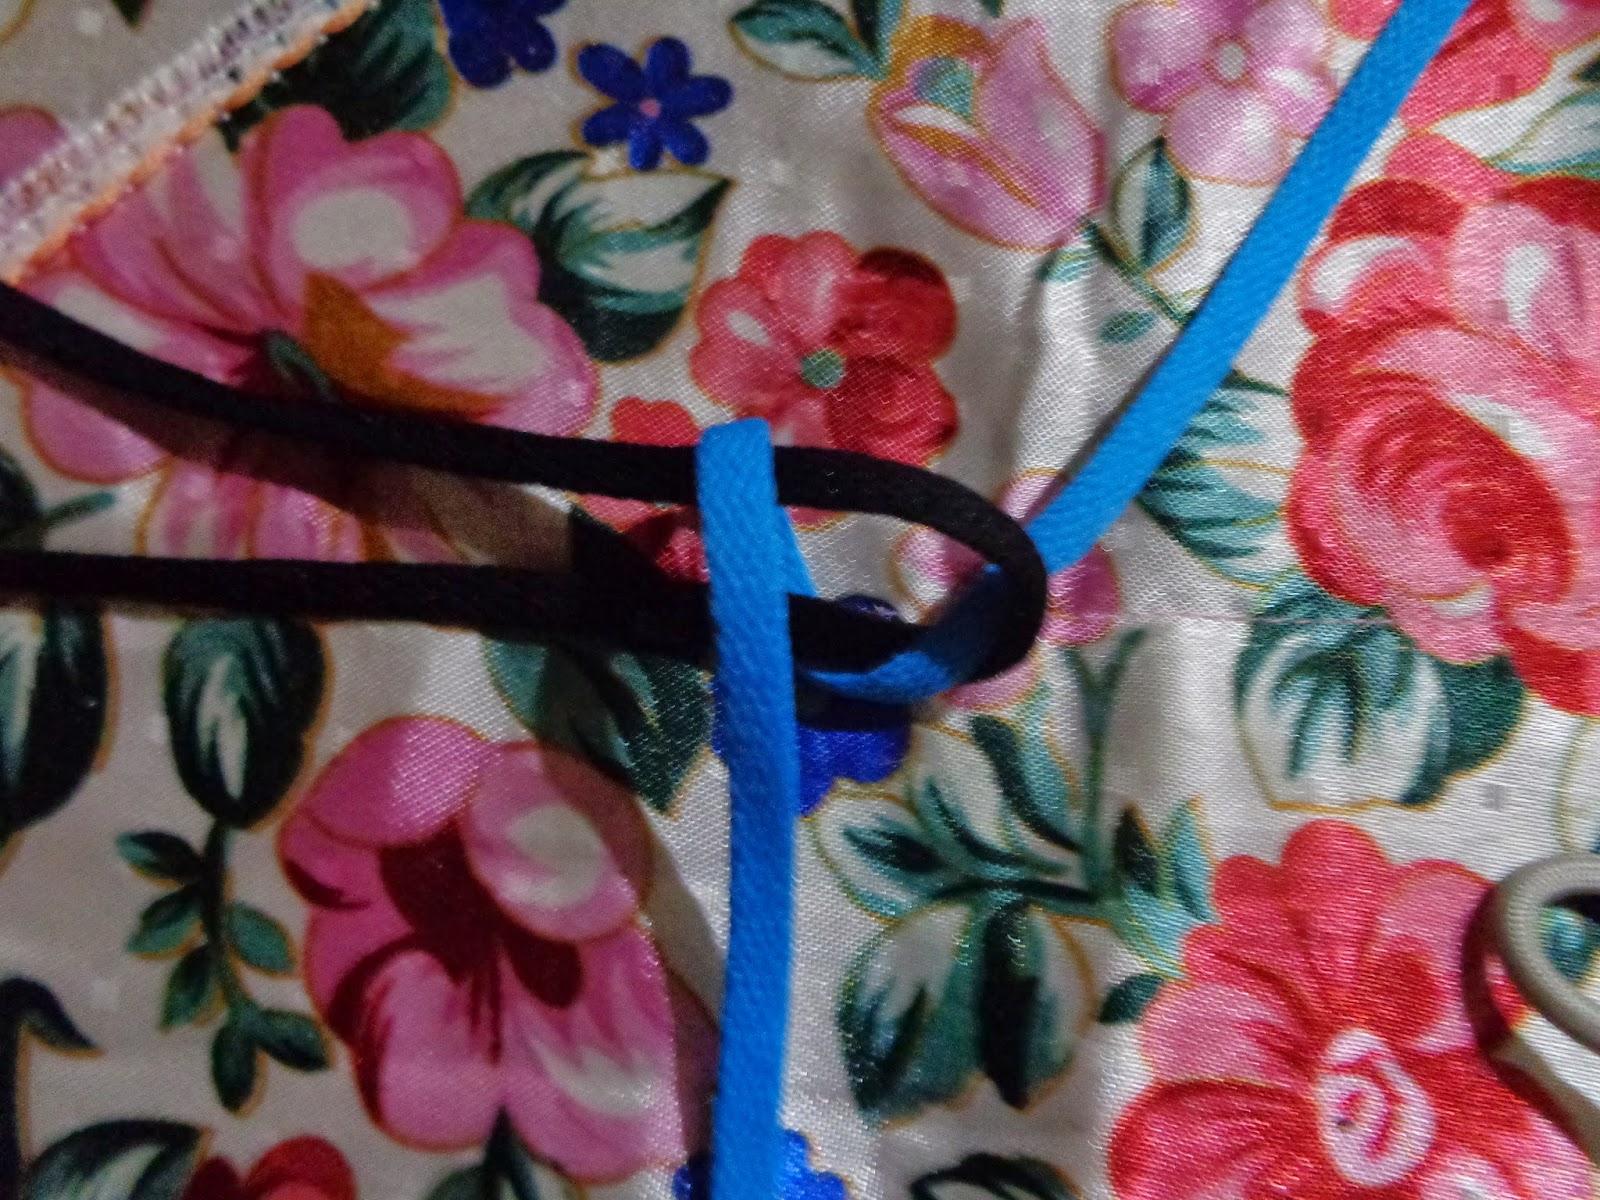 my favorites: kerajinan dari tali sepatu